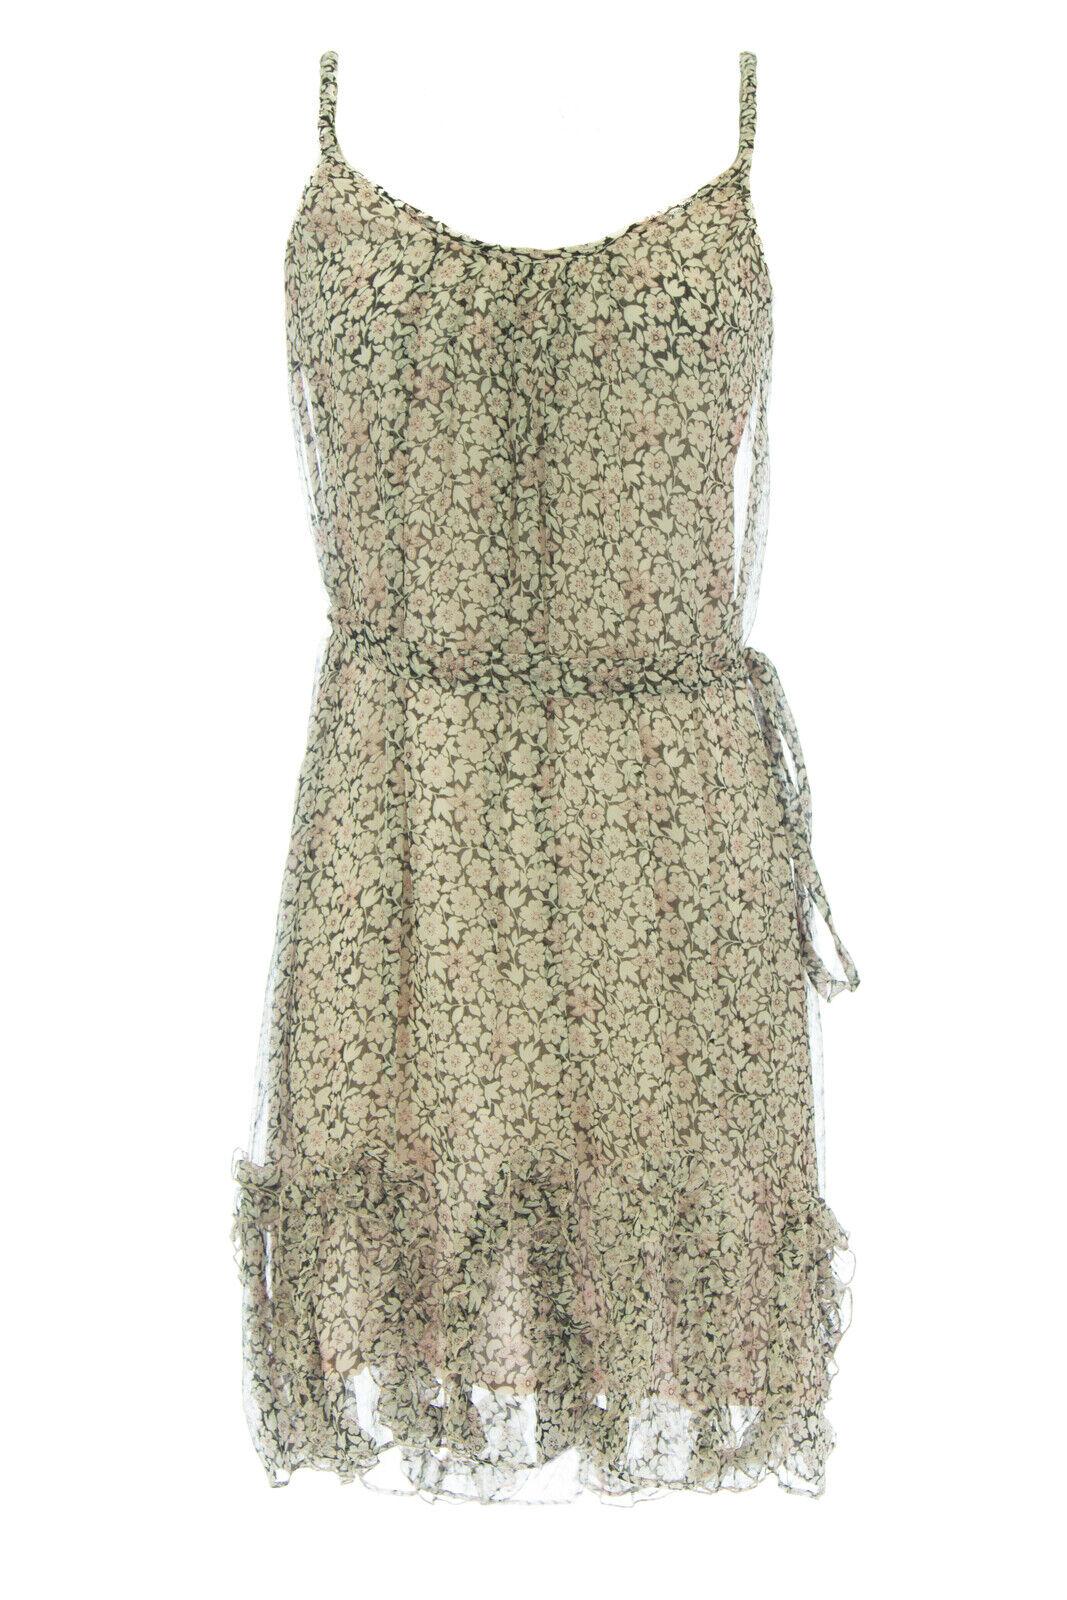 ANNE LEMAN Woherren Floral Blossom Tie-Waist Carnation Dress SP92DR11  NEW